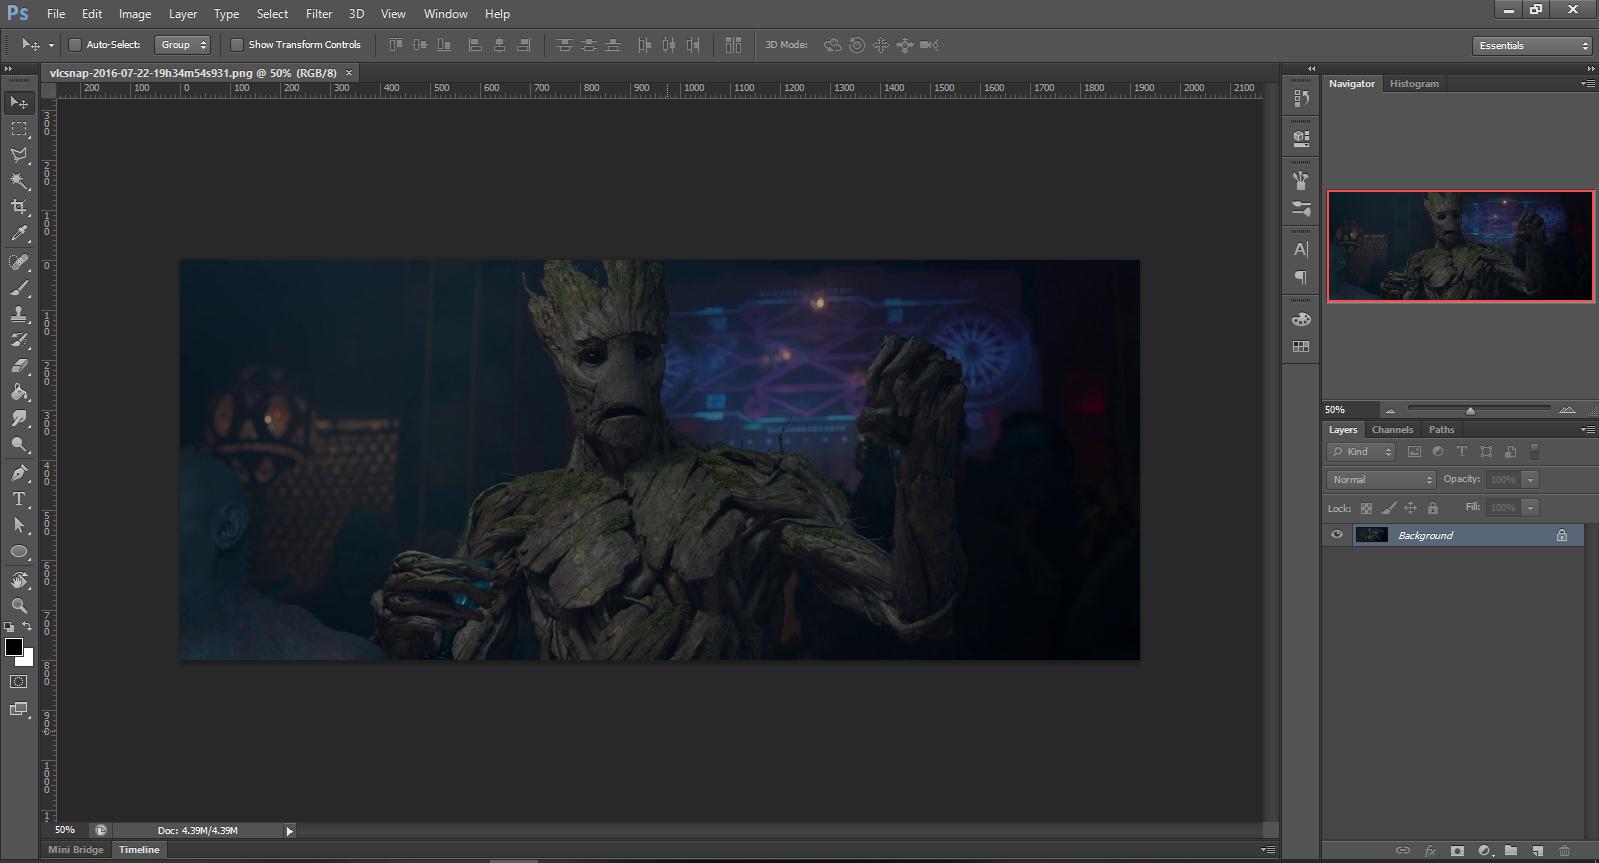 Screenshot of Groot opened in Photoshop